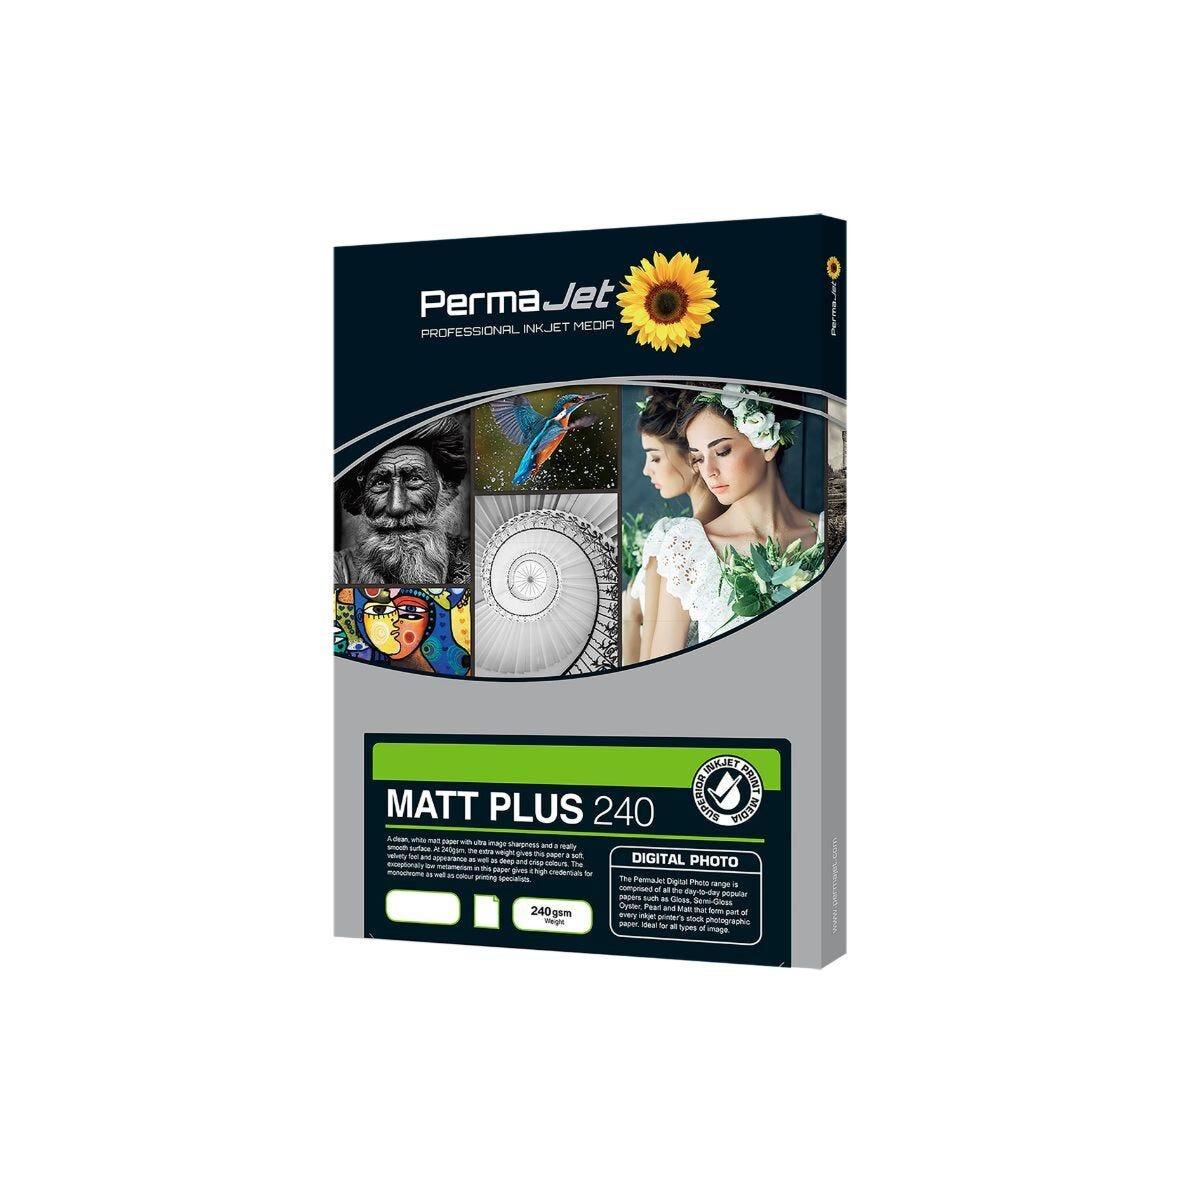 PermaJet Matt Plus 240 Paper A4 50 Sheets